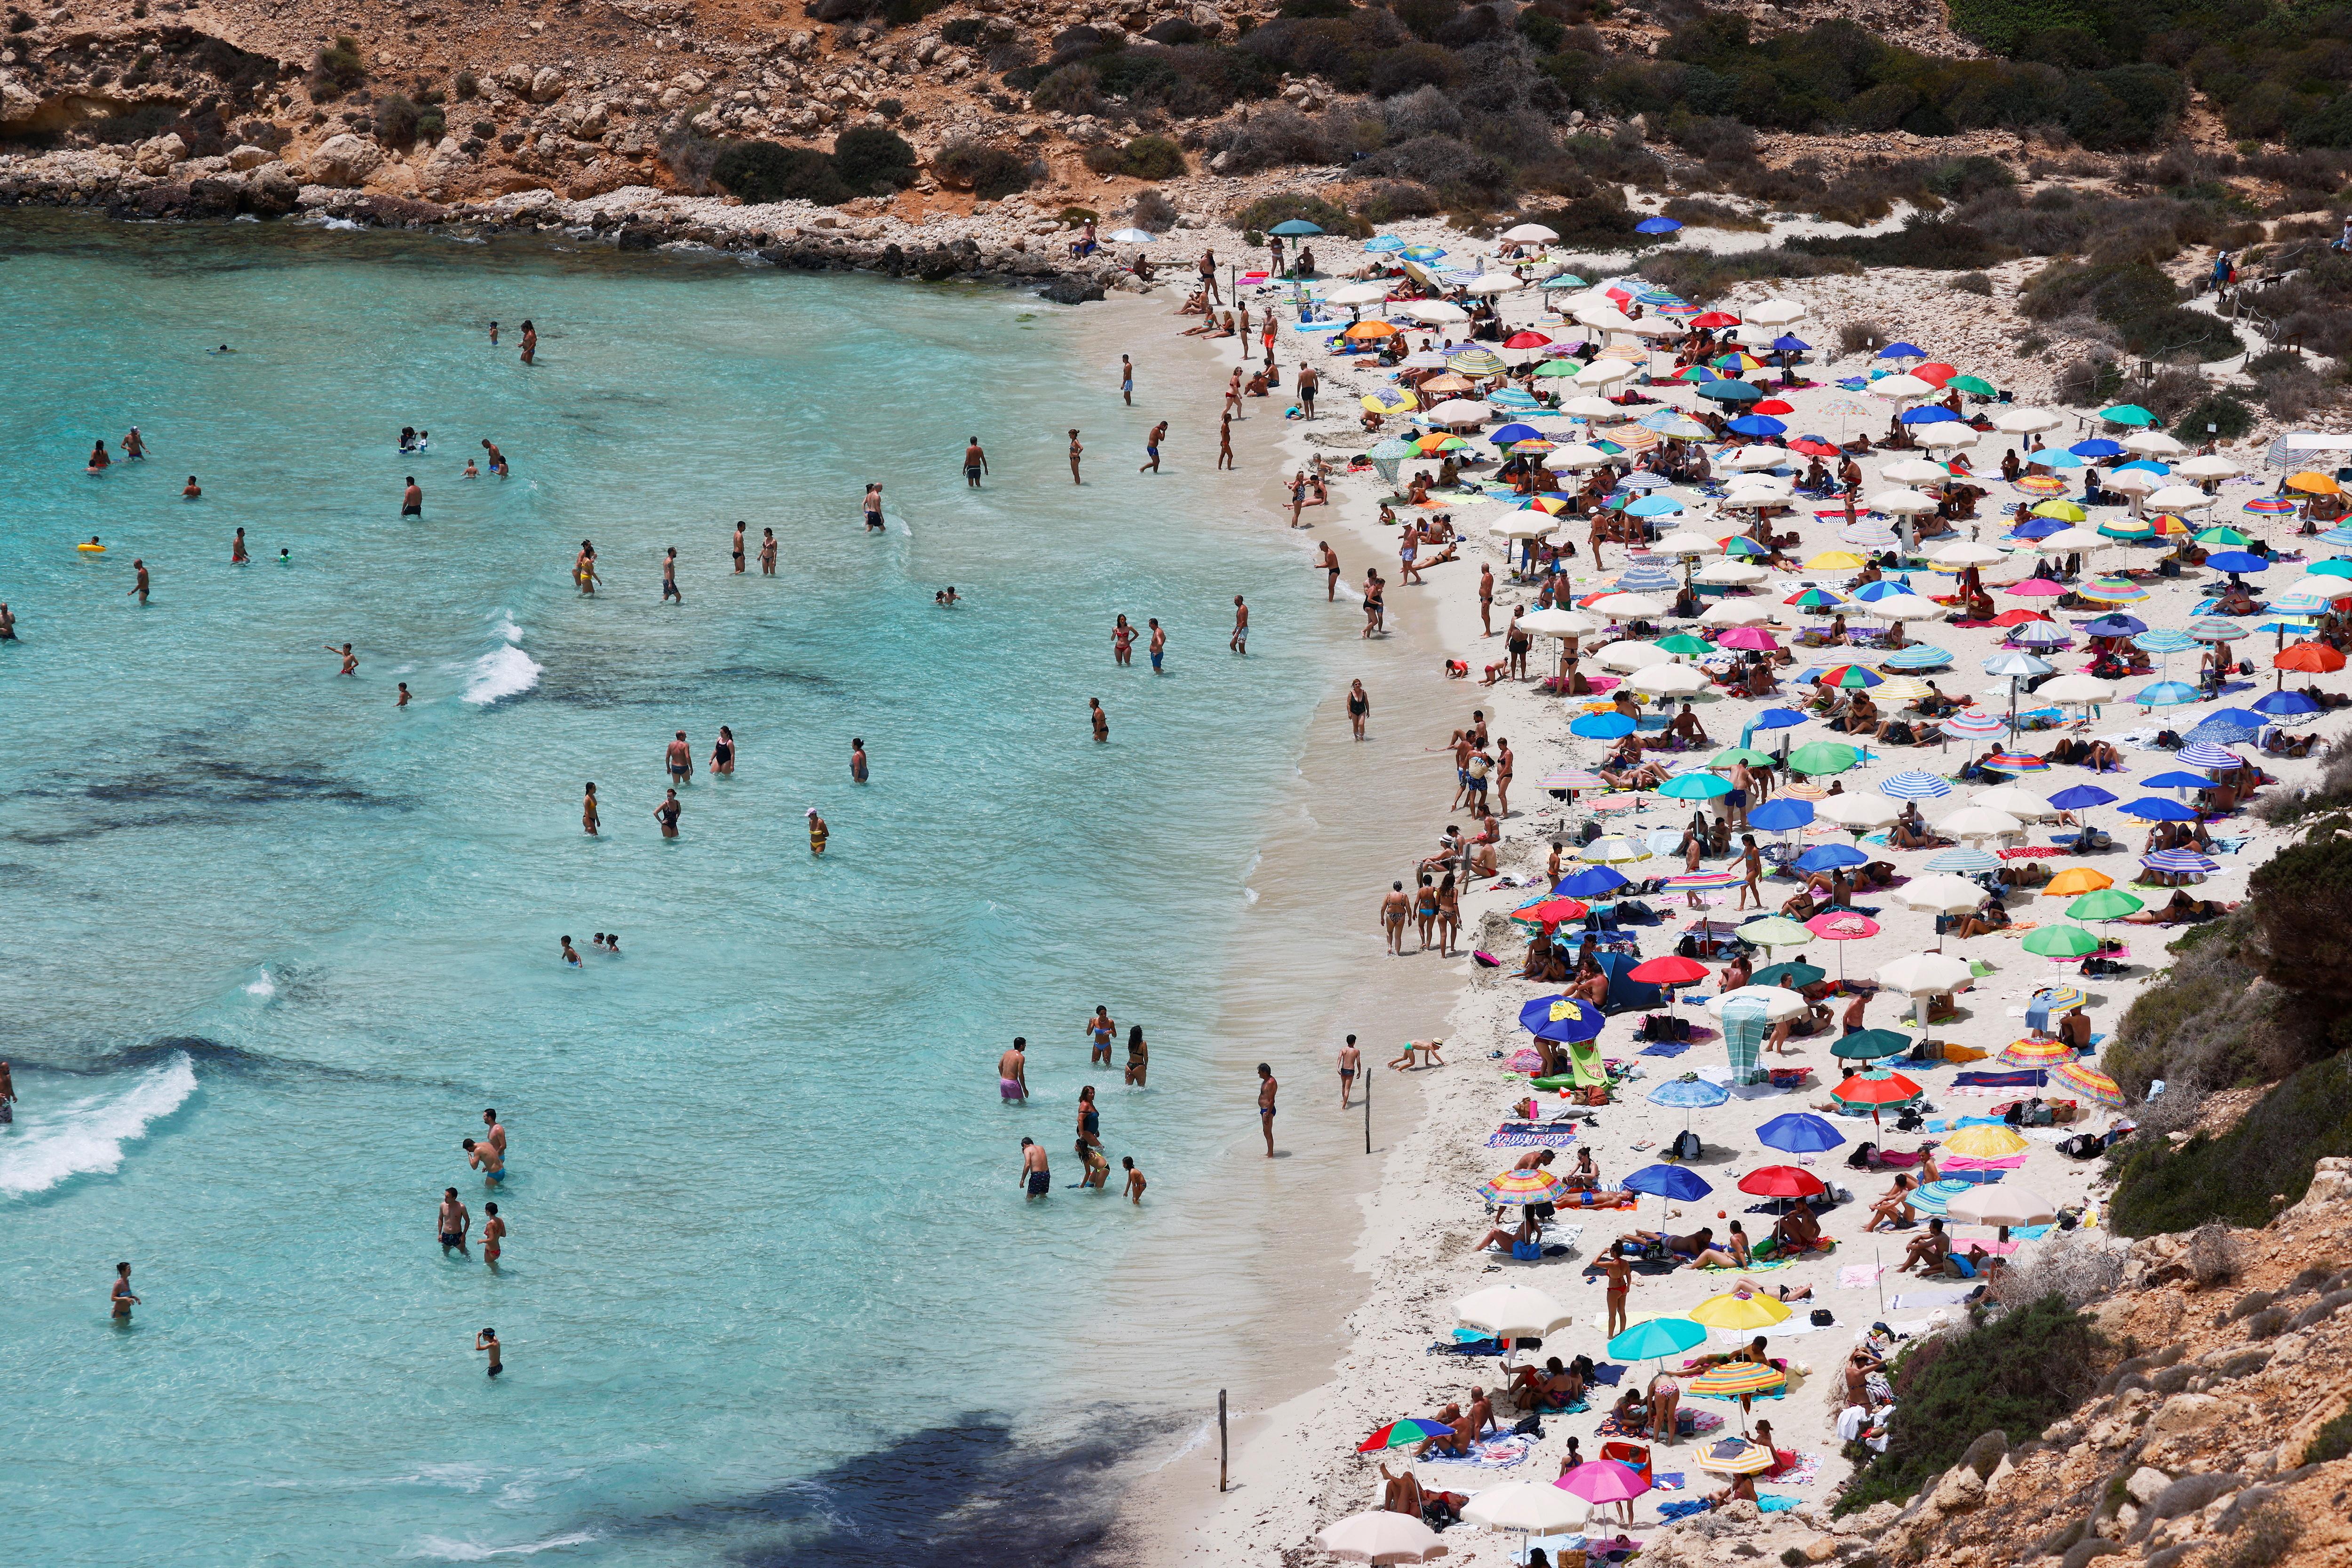 People sunbathe on the beach on the Sicilian island of Lampedusa, as a flow of migrants arriving on the Mediterranean island, in Lampedusa, Italy, June 22, 2021. REUTERS/Guglielmo Mangiapane